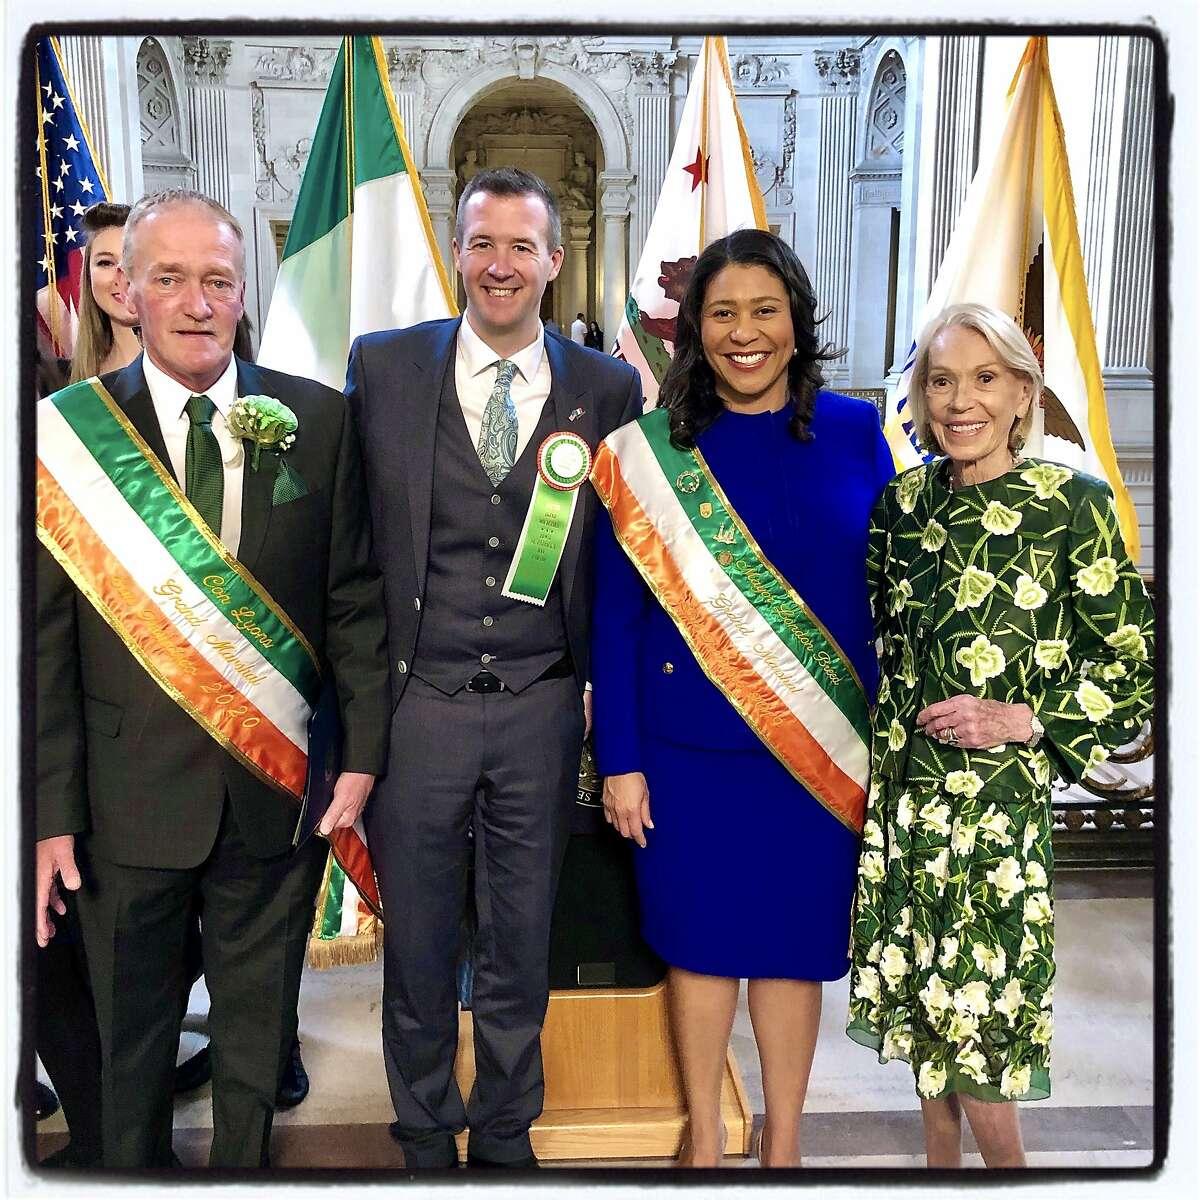 St. Patrick's Day Grand Marshall Con Lyons (left), Irish Consul General Robert O'Driscoll, Mayor London Breed and Protocol Chief Charlotte Shultz. March 6, 2020.